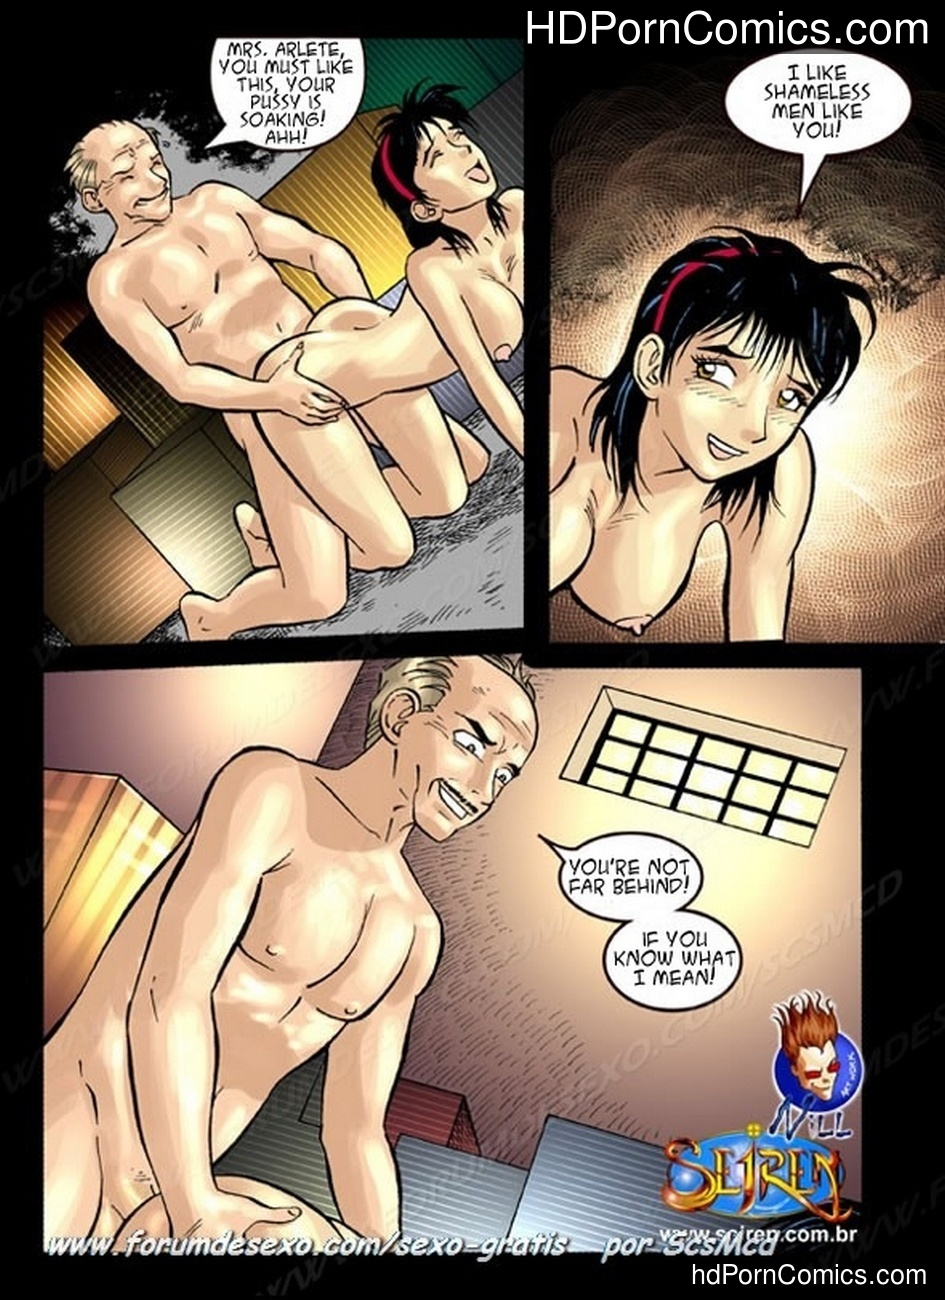 Levando Mandioca 21 free sex comic